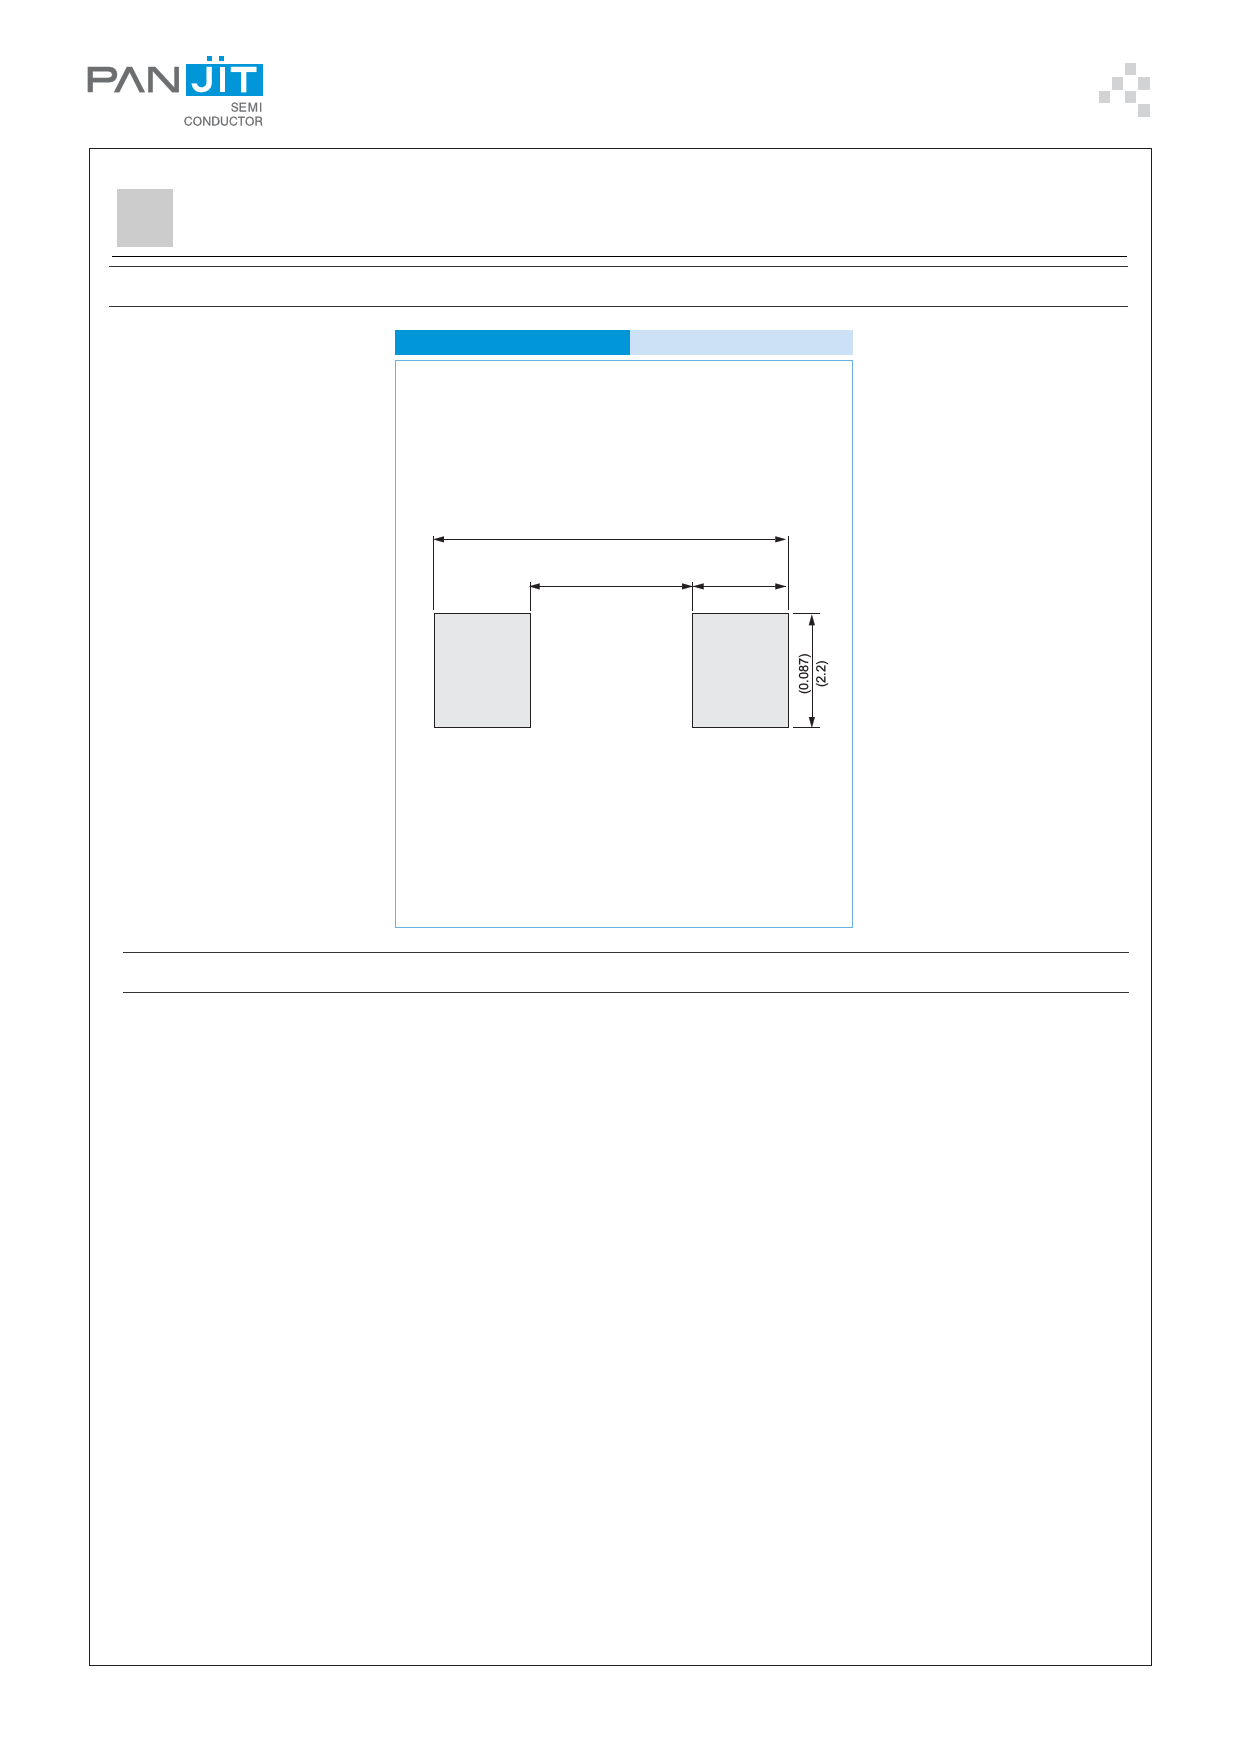 UF2AF pdf, 반도체, 판매, 대치품